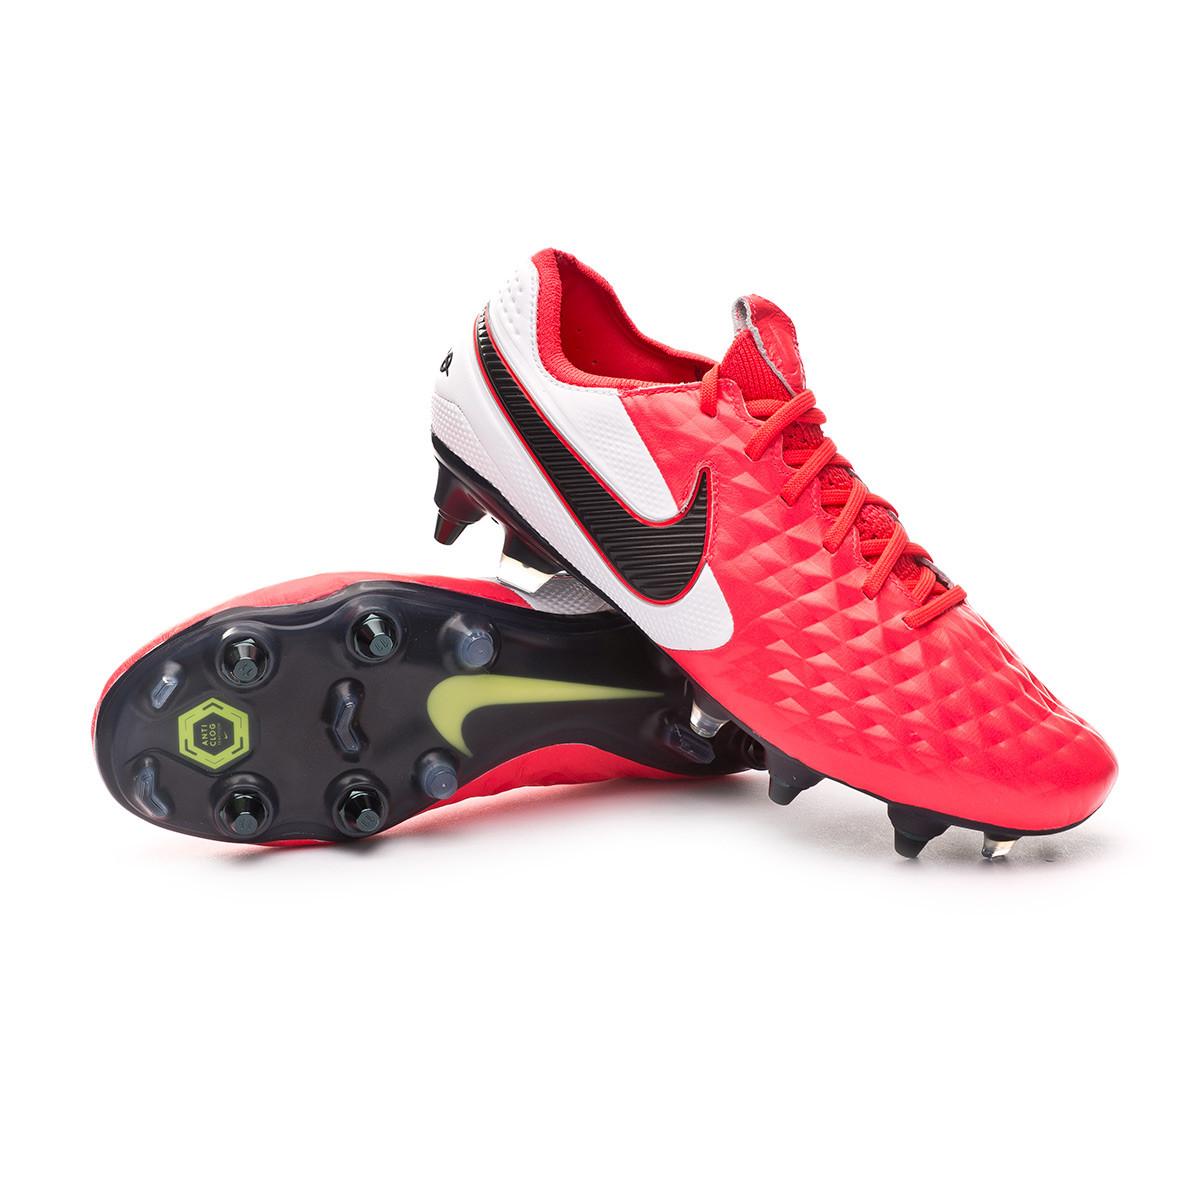 Chaussure de foot Nike Tiempo Legend VIII Elite SG PRO Anti Clog Traction